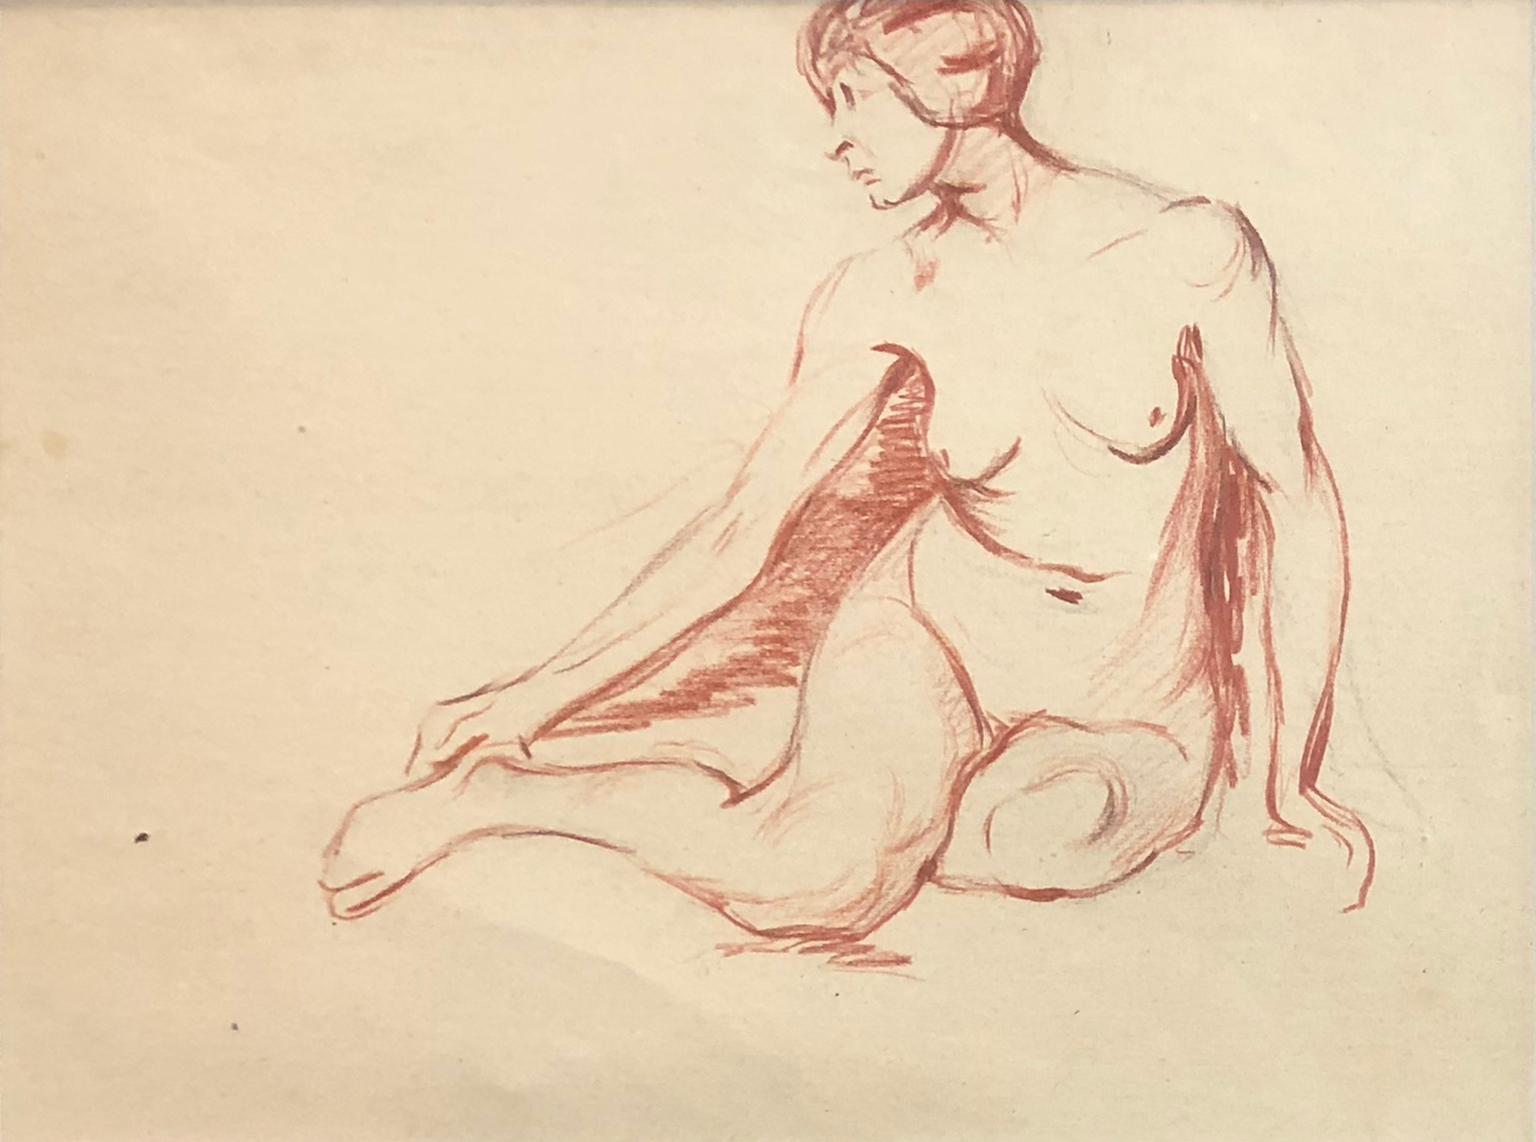 Australian School - Female Nude Study - Academic - Circa 1950s